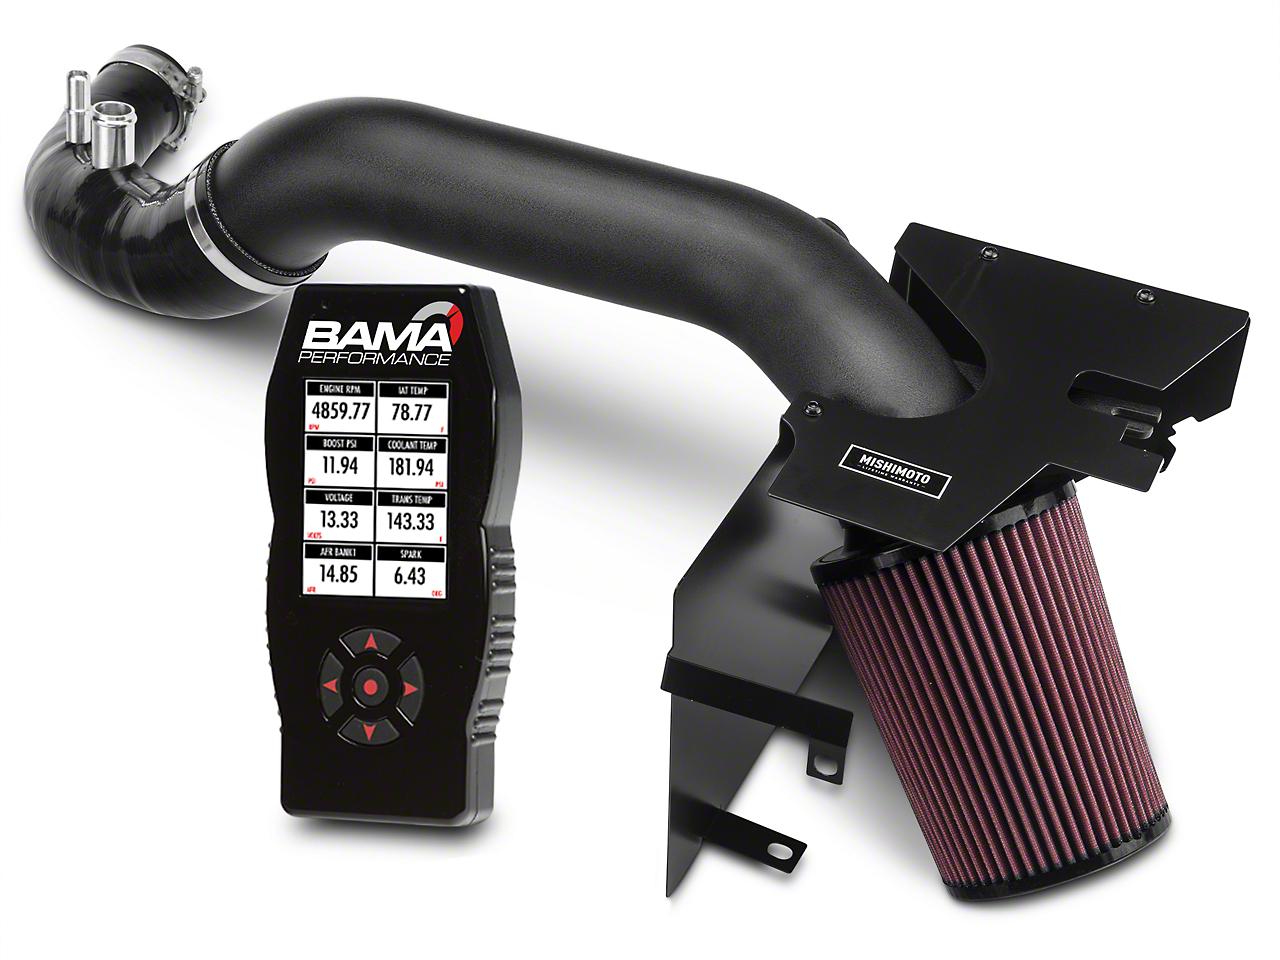 Mishimoto Performance Air Intake - Wrinkle Black & Bama X4 Tuner (15-17 EcoBoost)